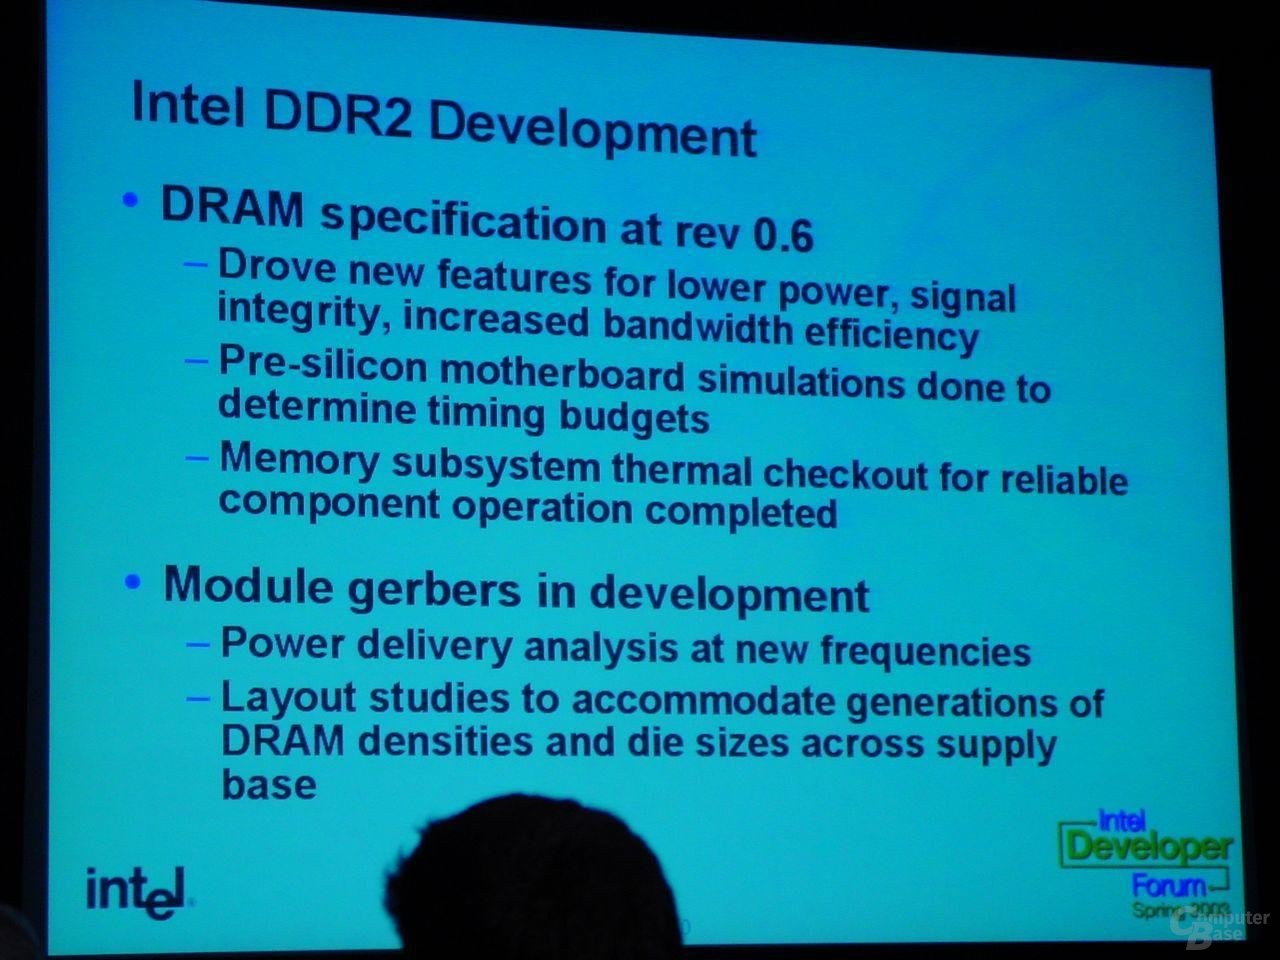 DDR2 Entwicklung